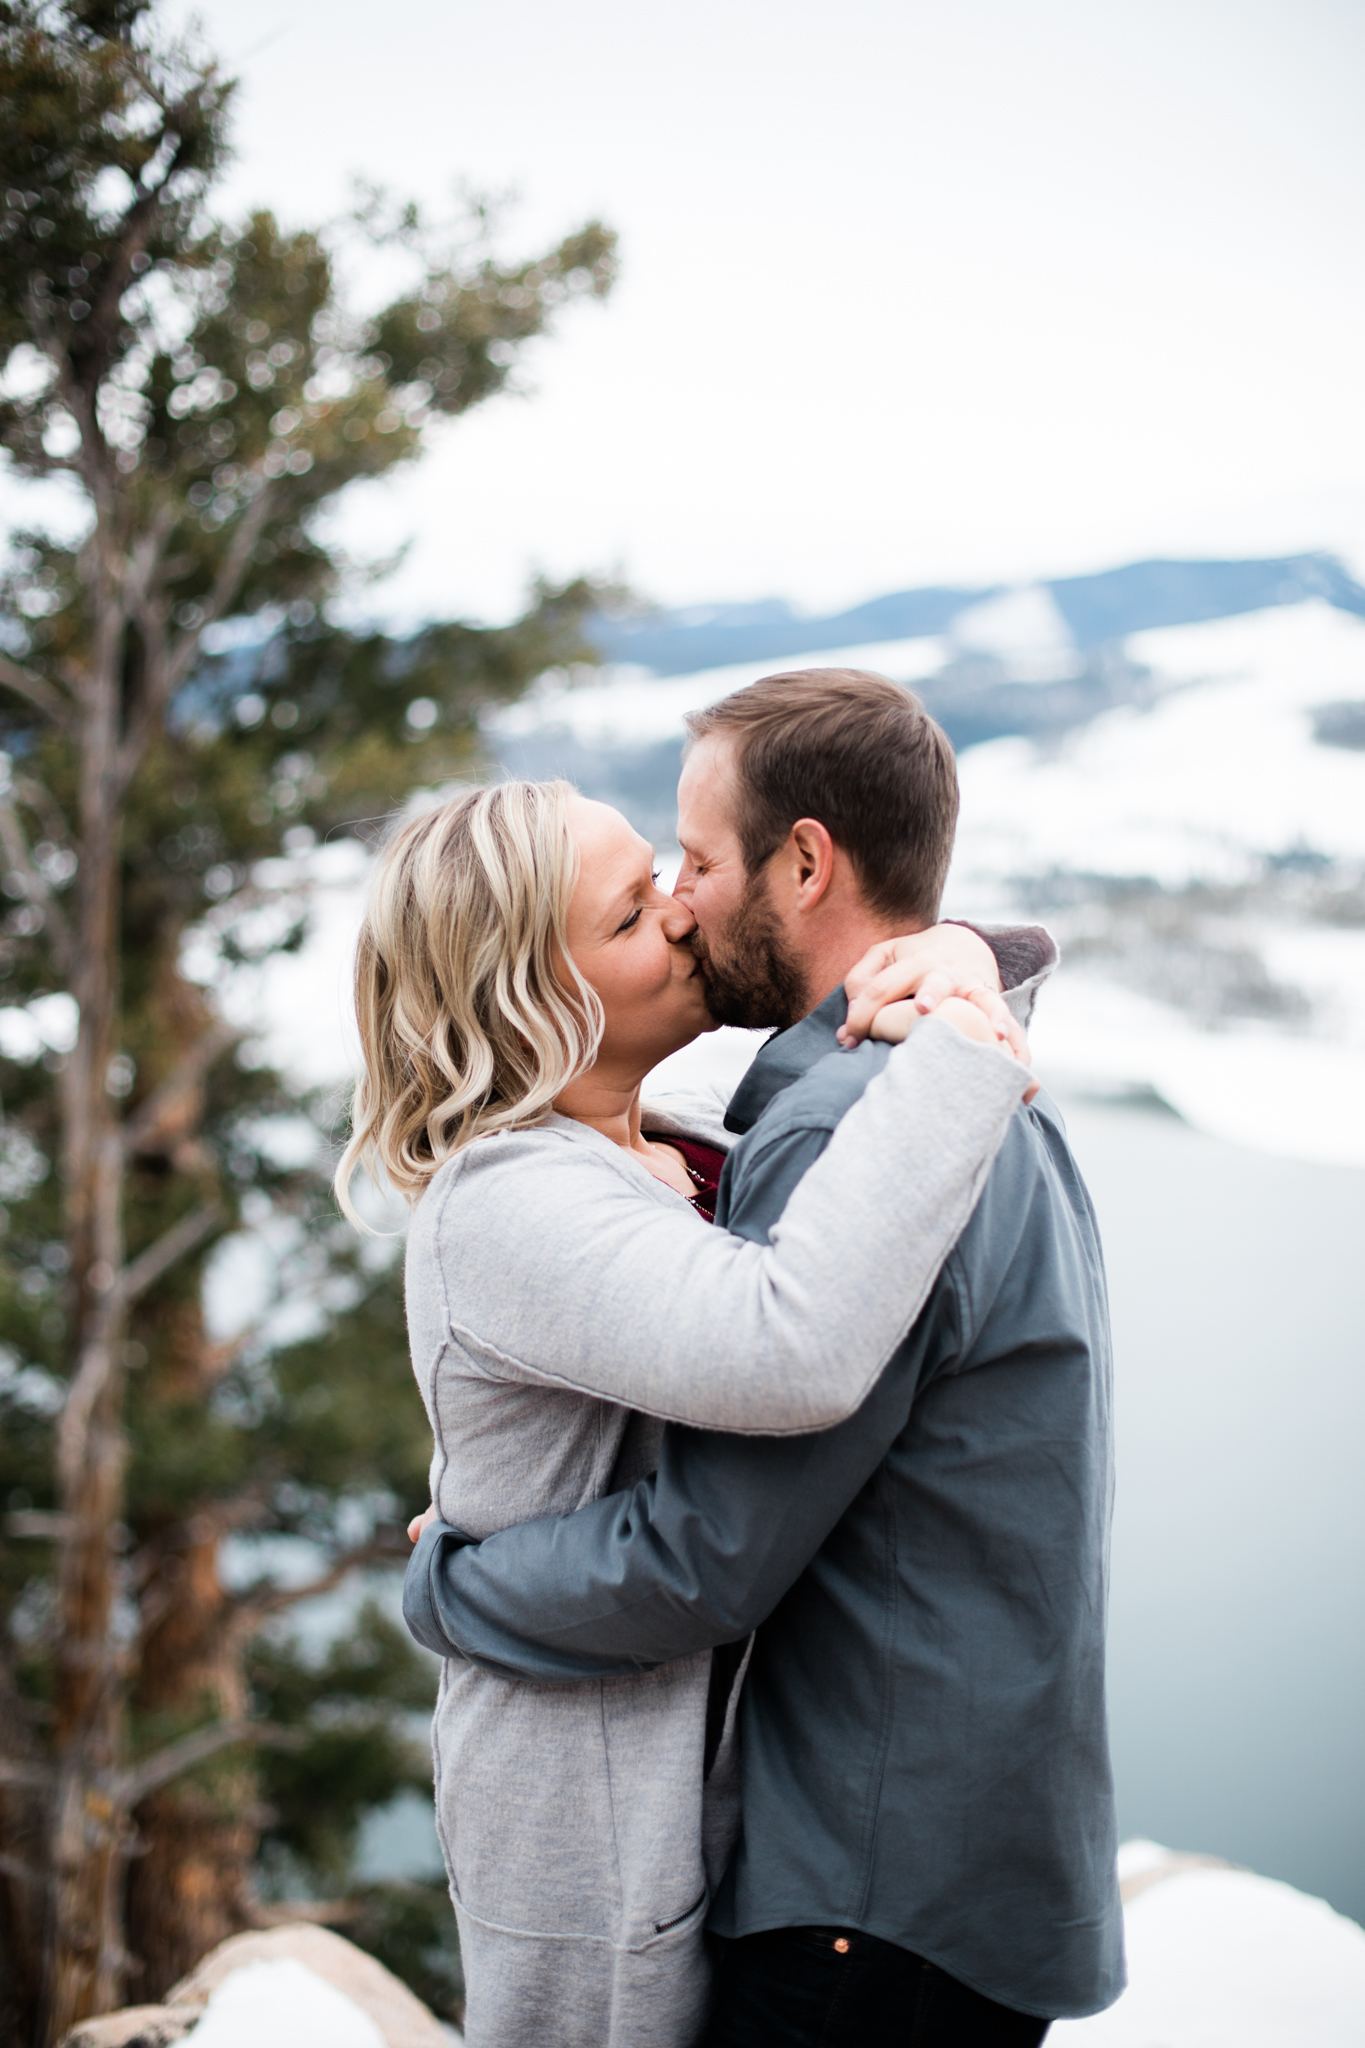 Lake Dillon Colorado Winter Engagement Session